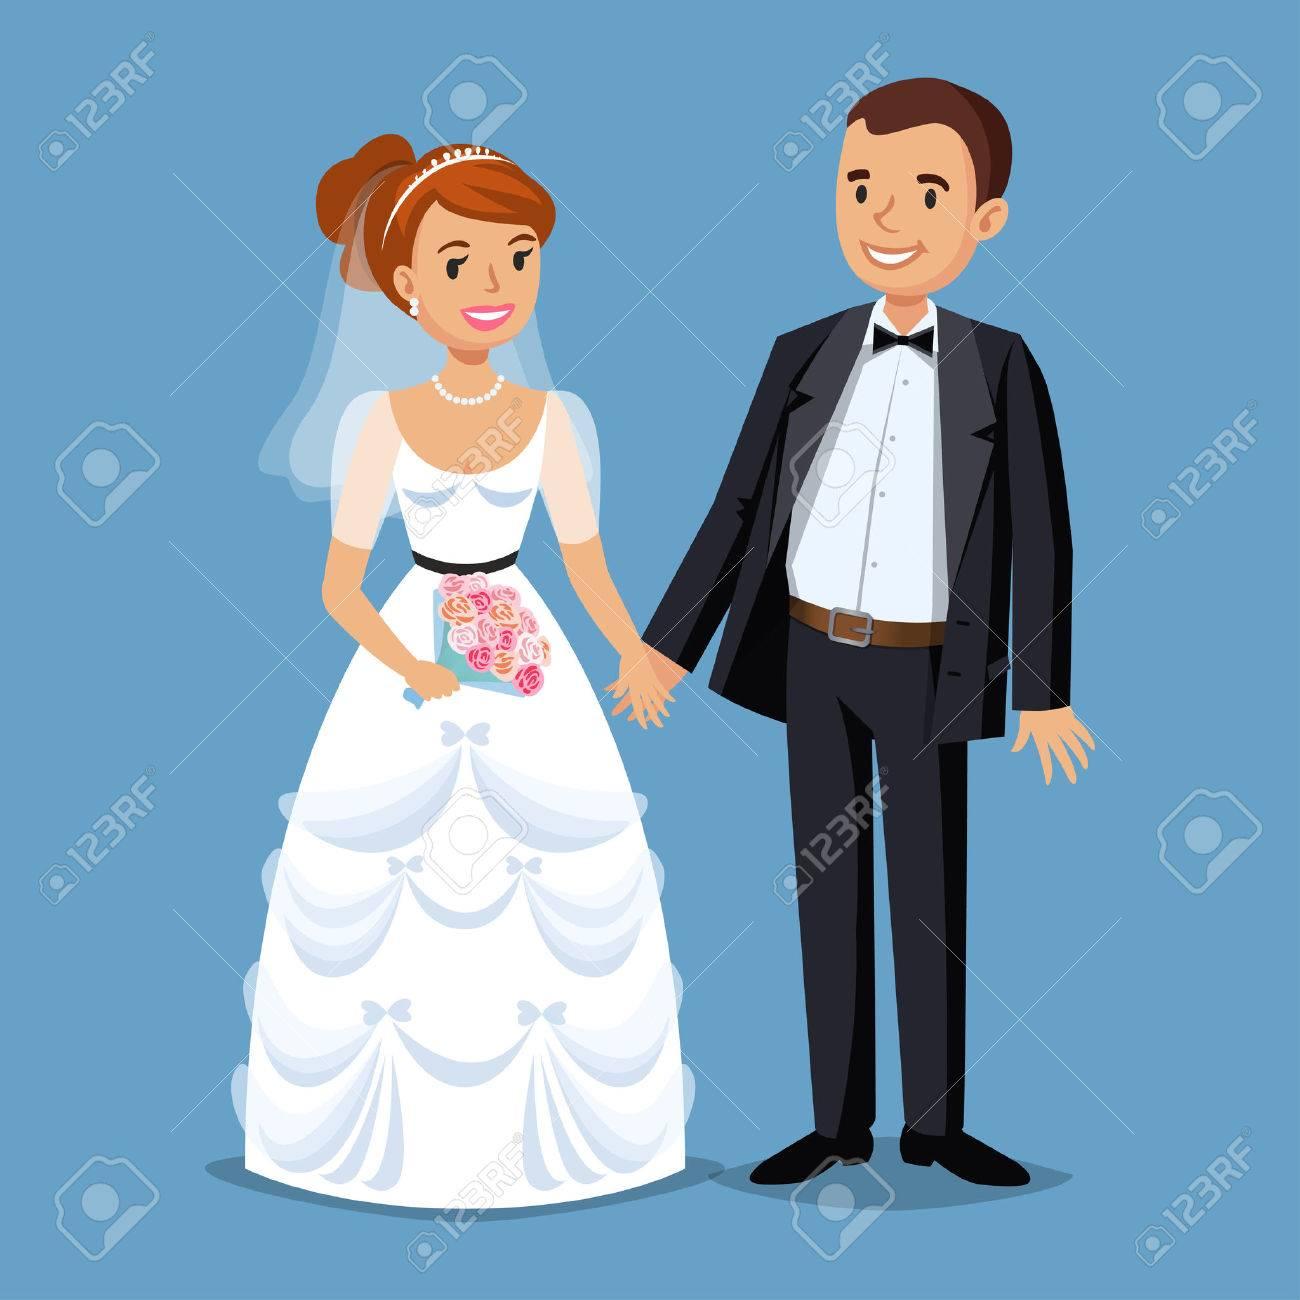 Cute Bride and groom, Wedding Party set illustration. Cartoon Wedding people couple. Vector illustration - 53256203